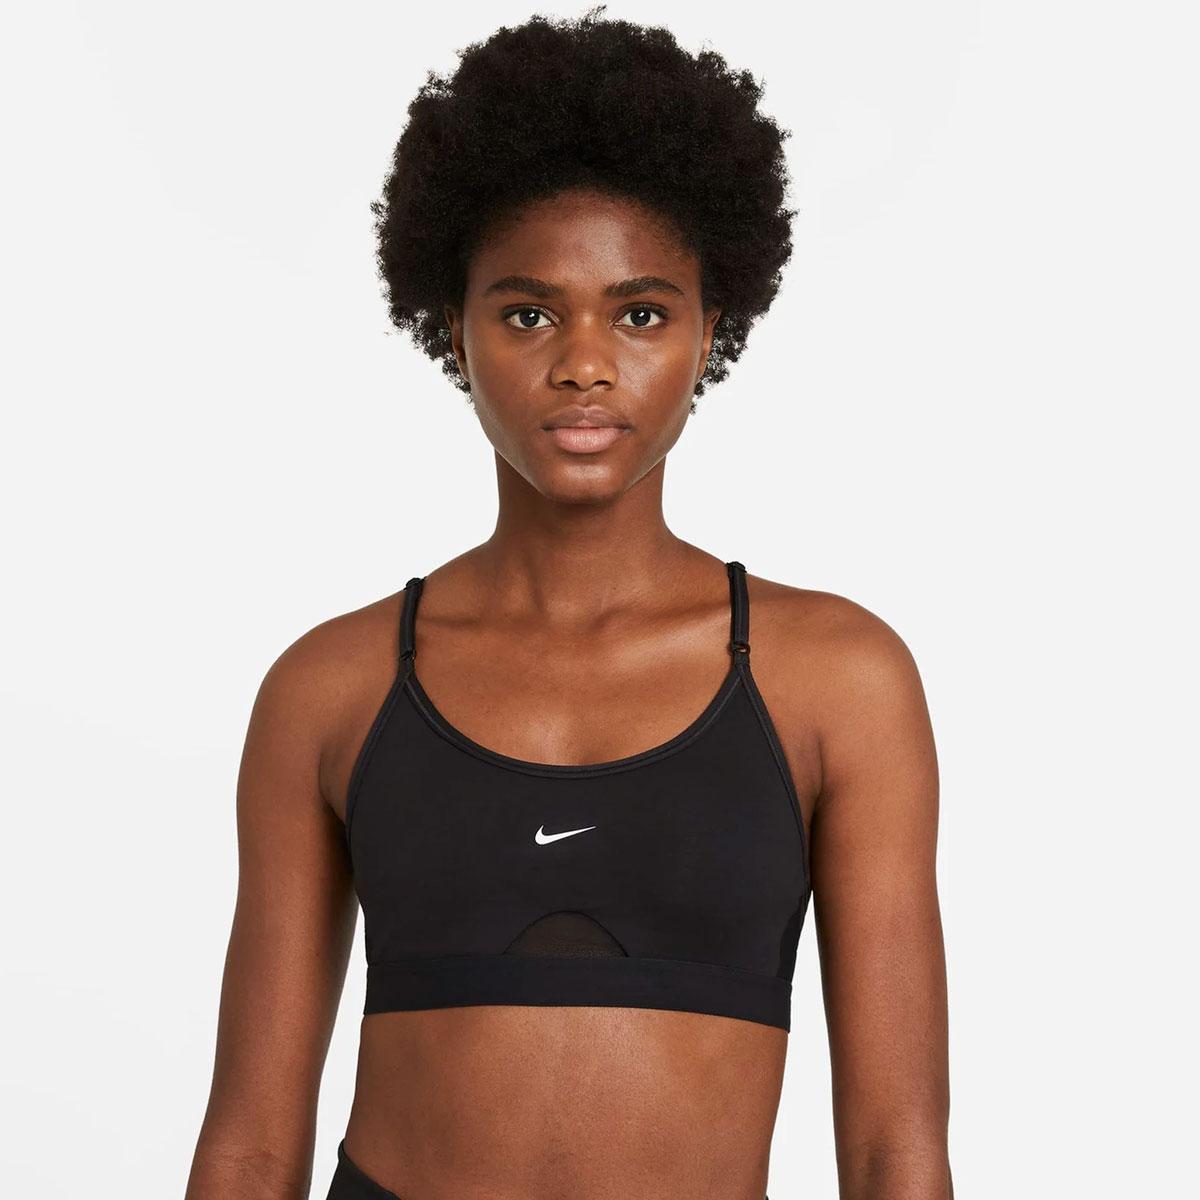 Women's Indy U-Neck Bra, Black, swatch